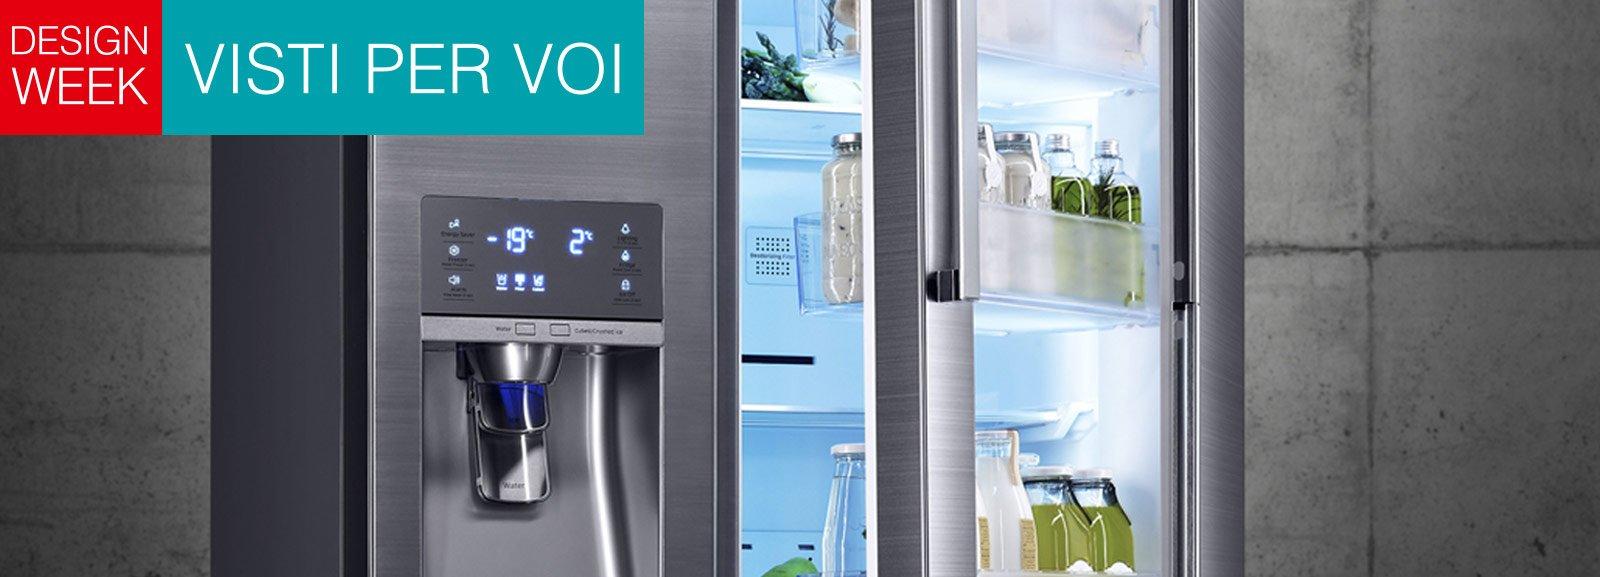 Cucina hi tech risparmiare energia con il frigo diviso in for Nuovo frigo samsung